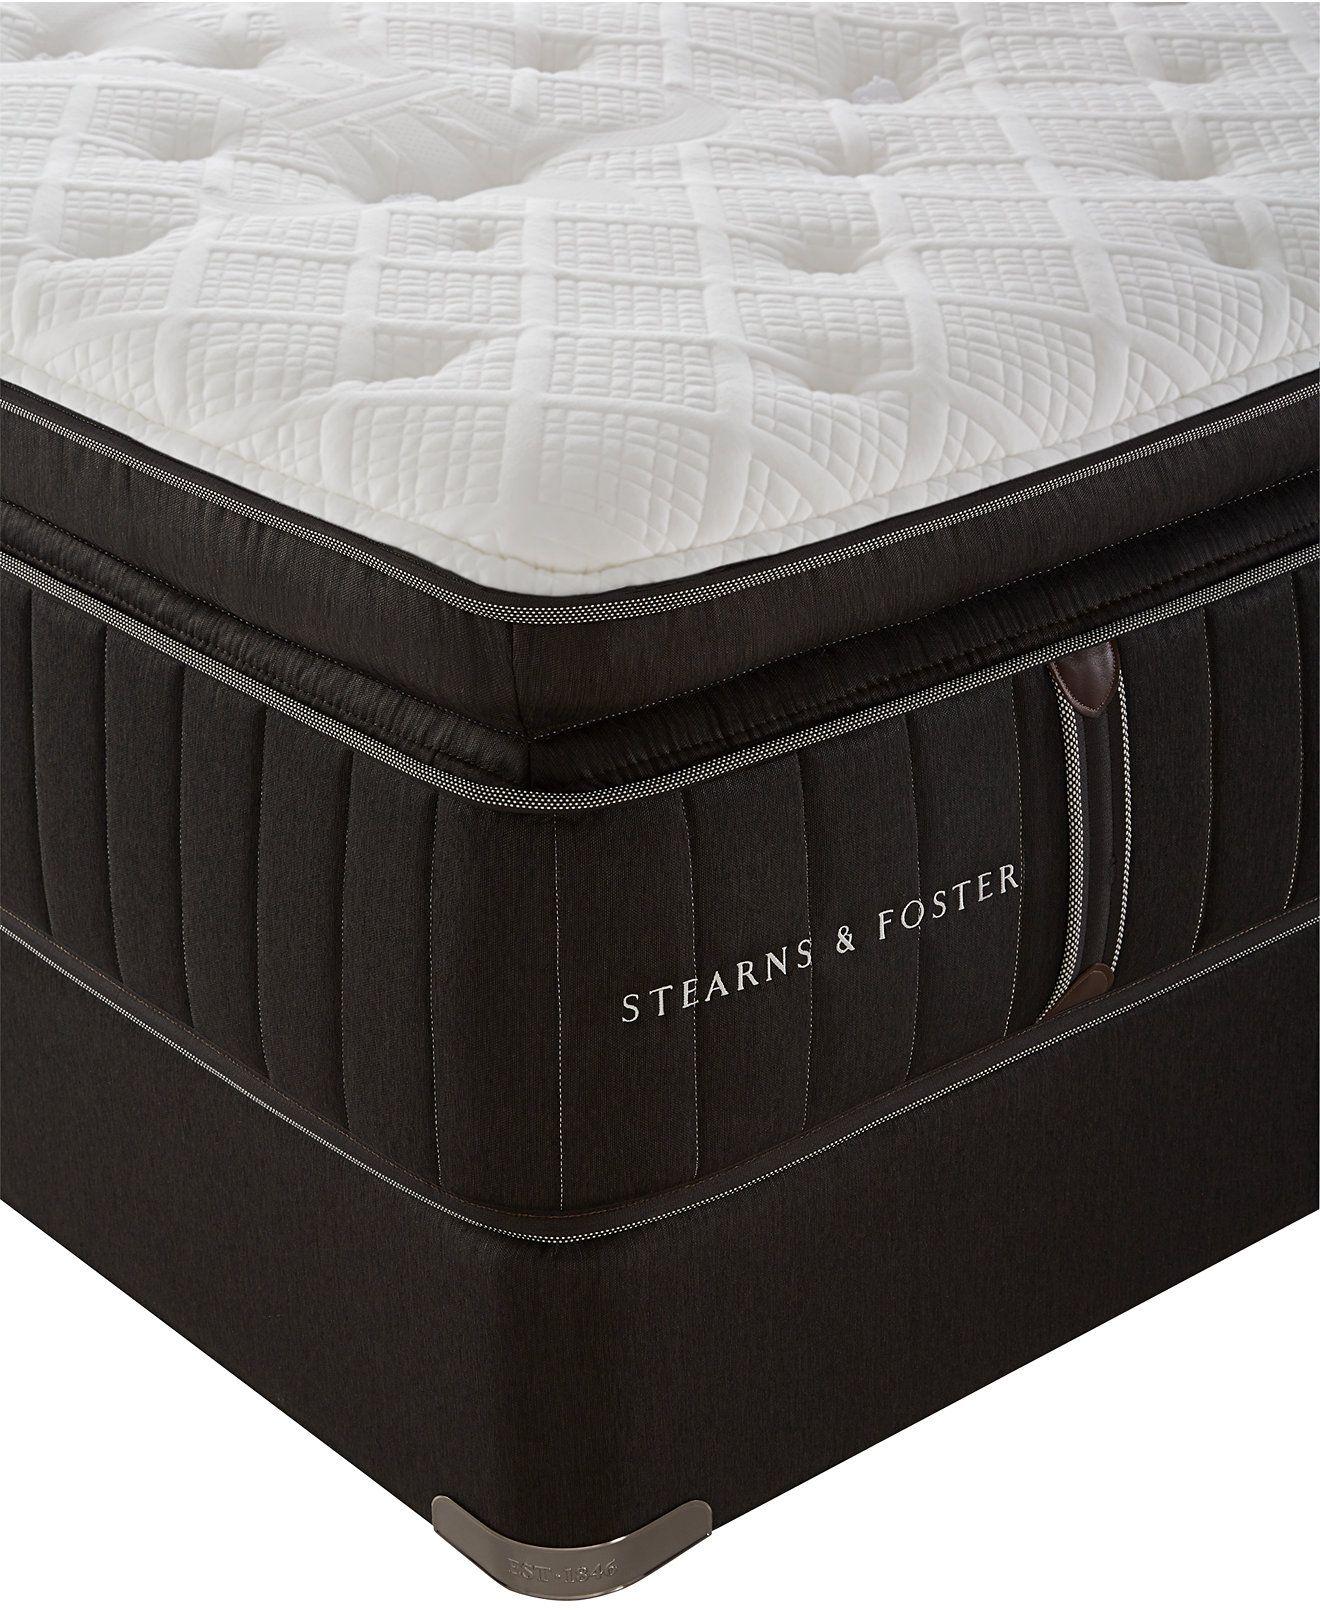 - Stearns & Foster Estate Lux Salzburg Luxury Plush Euro Pillowtop